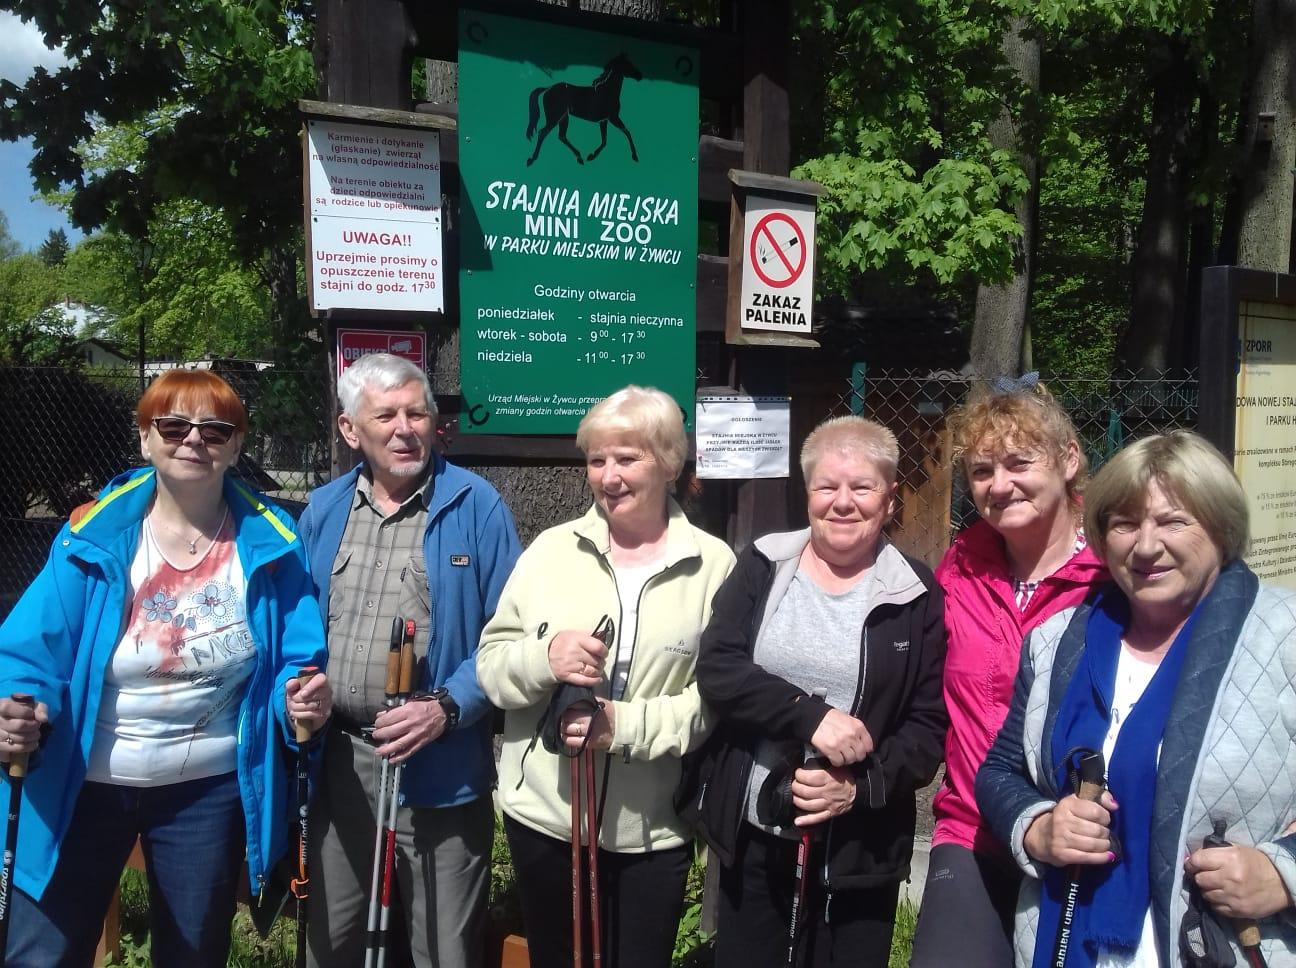 VII Ogólnopolski Marsz Nordic Walking UTW – 11.05.2019r